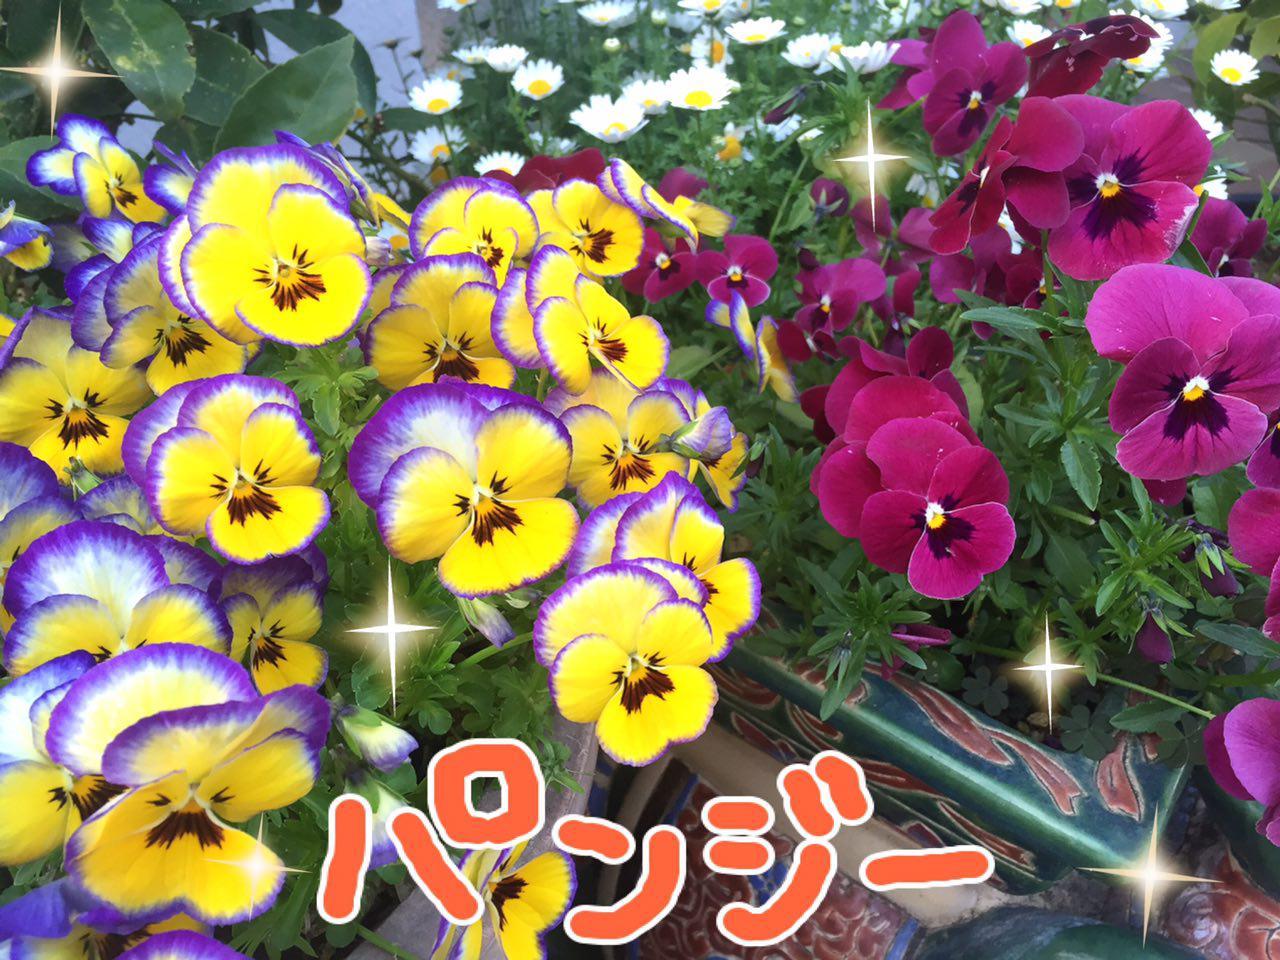 photo_2017-04-15_22-59-29.jpg